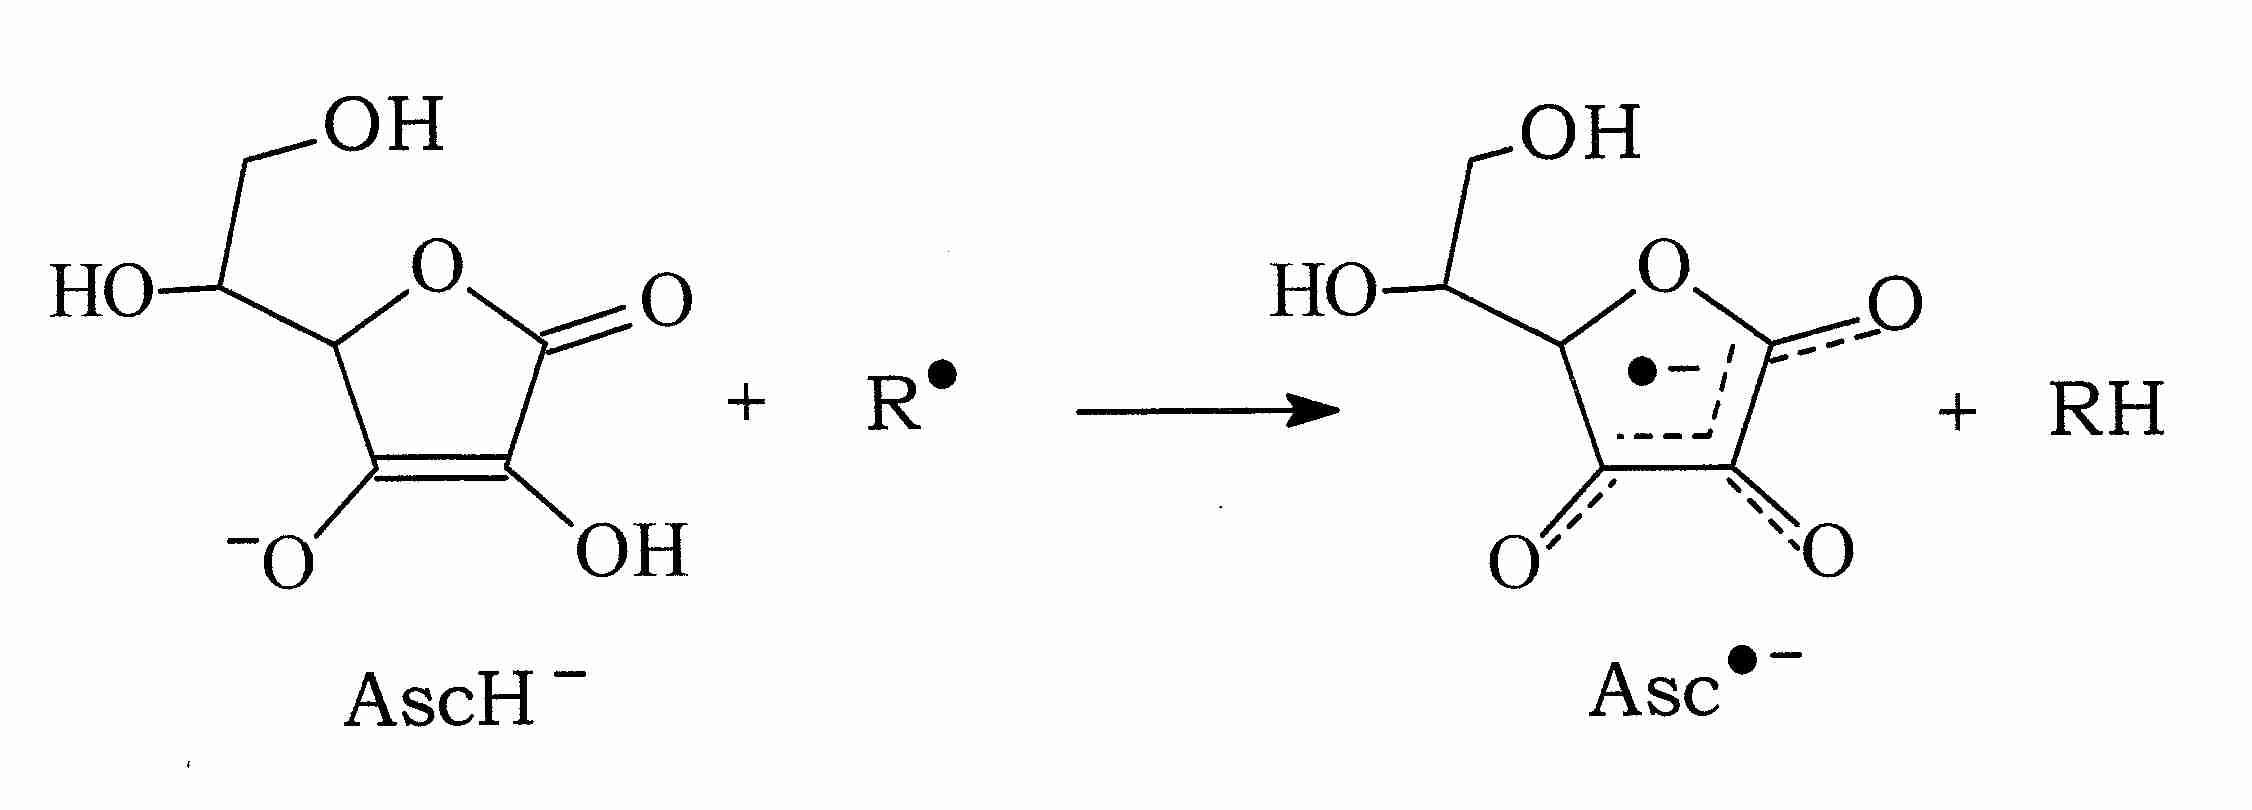 Vitamin C  C6H8O6  ChemSpider